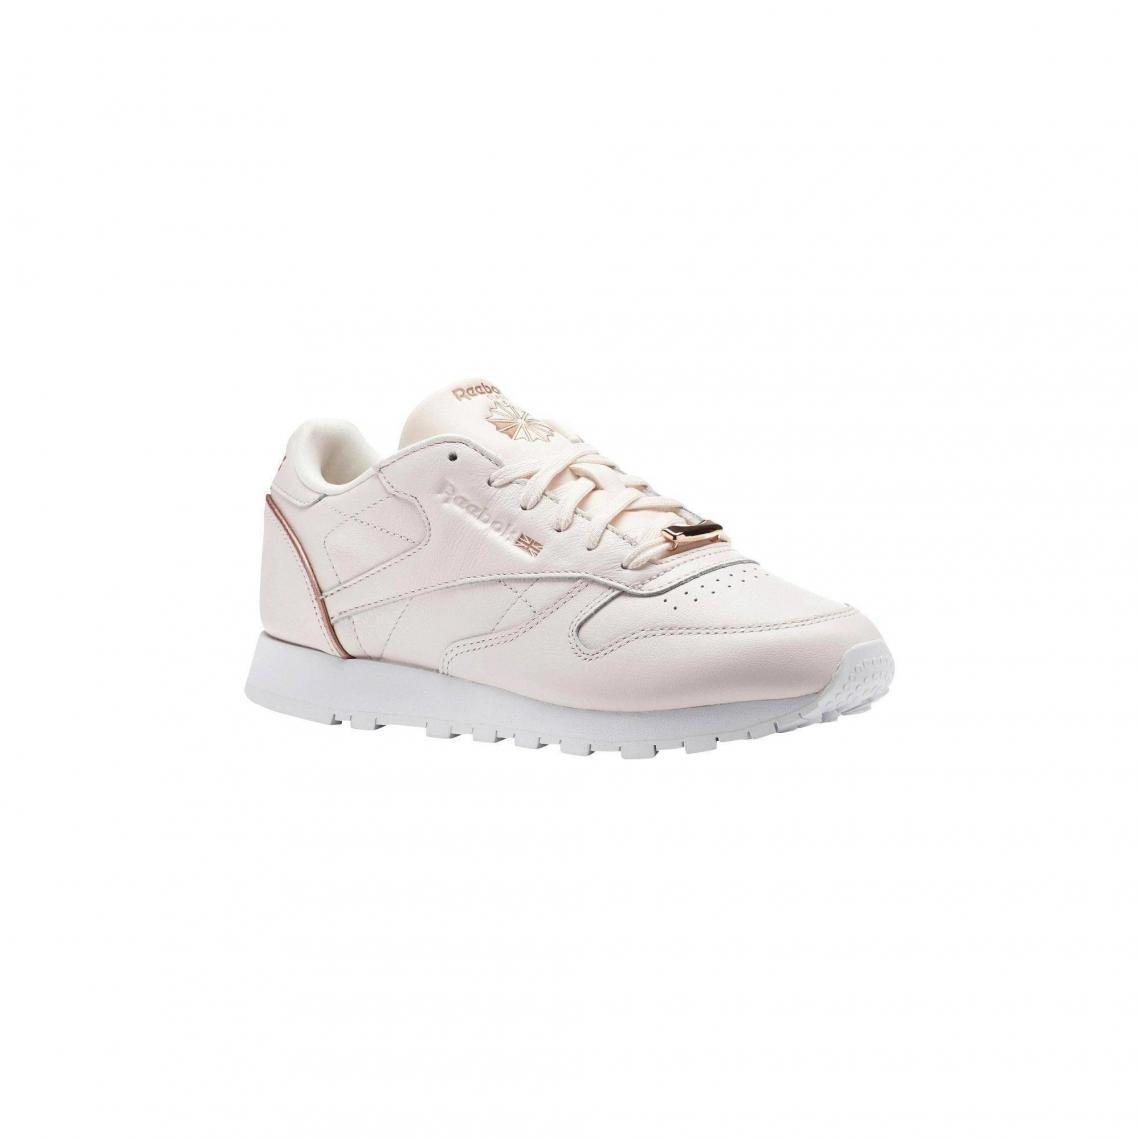 0821bb2d17f Classic femme de Rose Chaussures Clair HW Reebok sport Leather dBId1xw